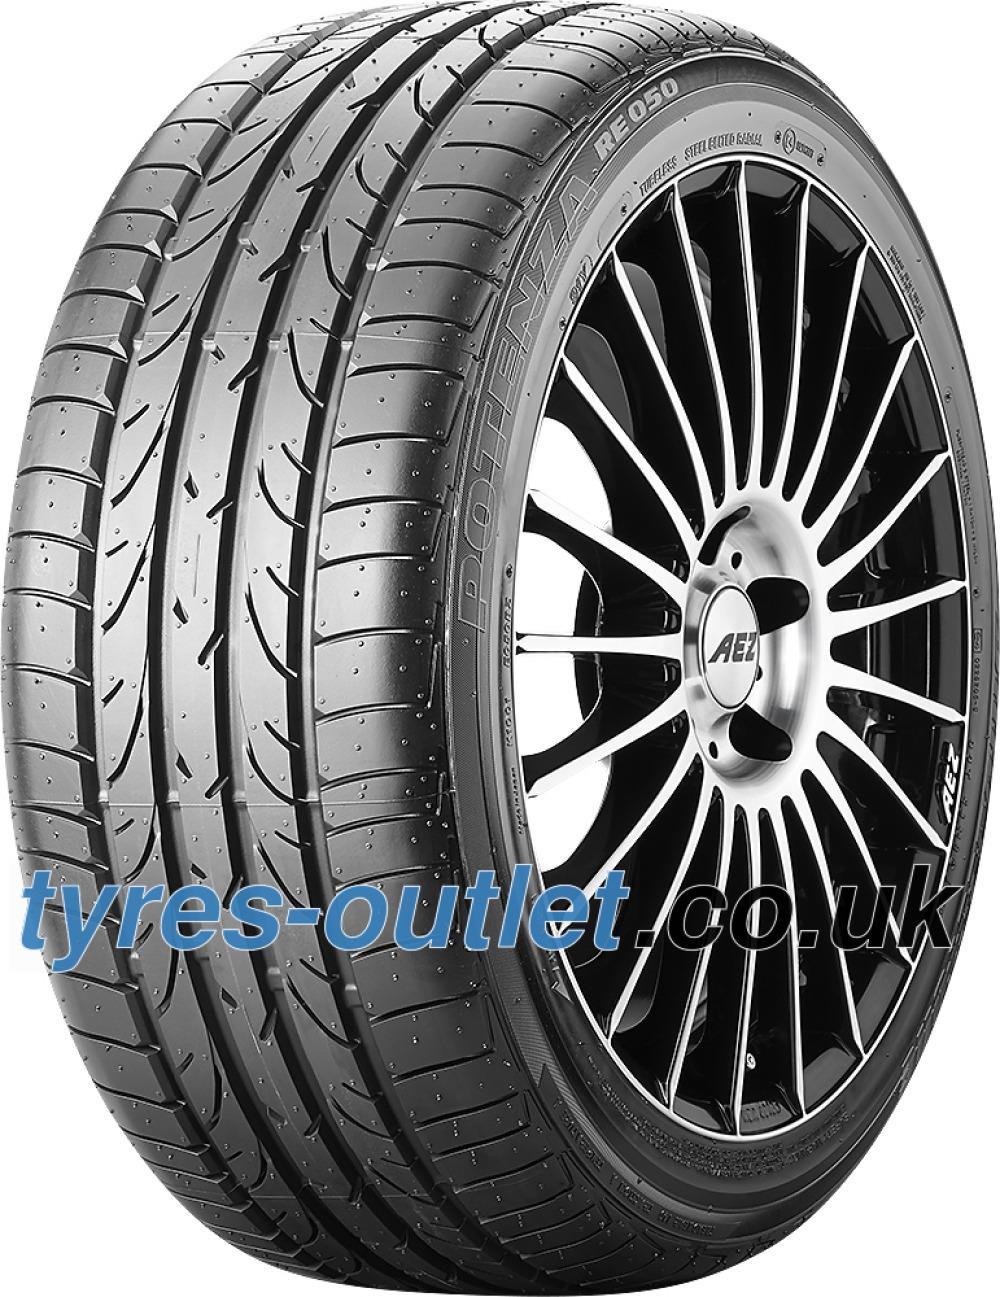 Bridgestone Potenza RE 050 RFT ( 245/45 R17 95Y runflat, *, with rim protection (MFS) )